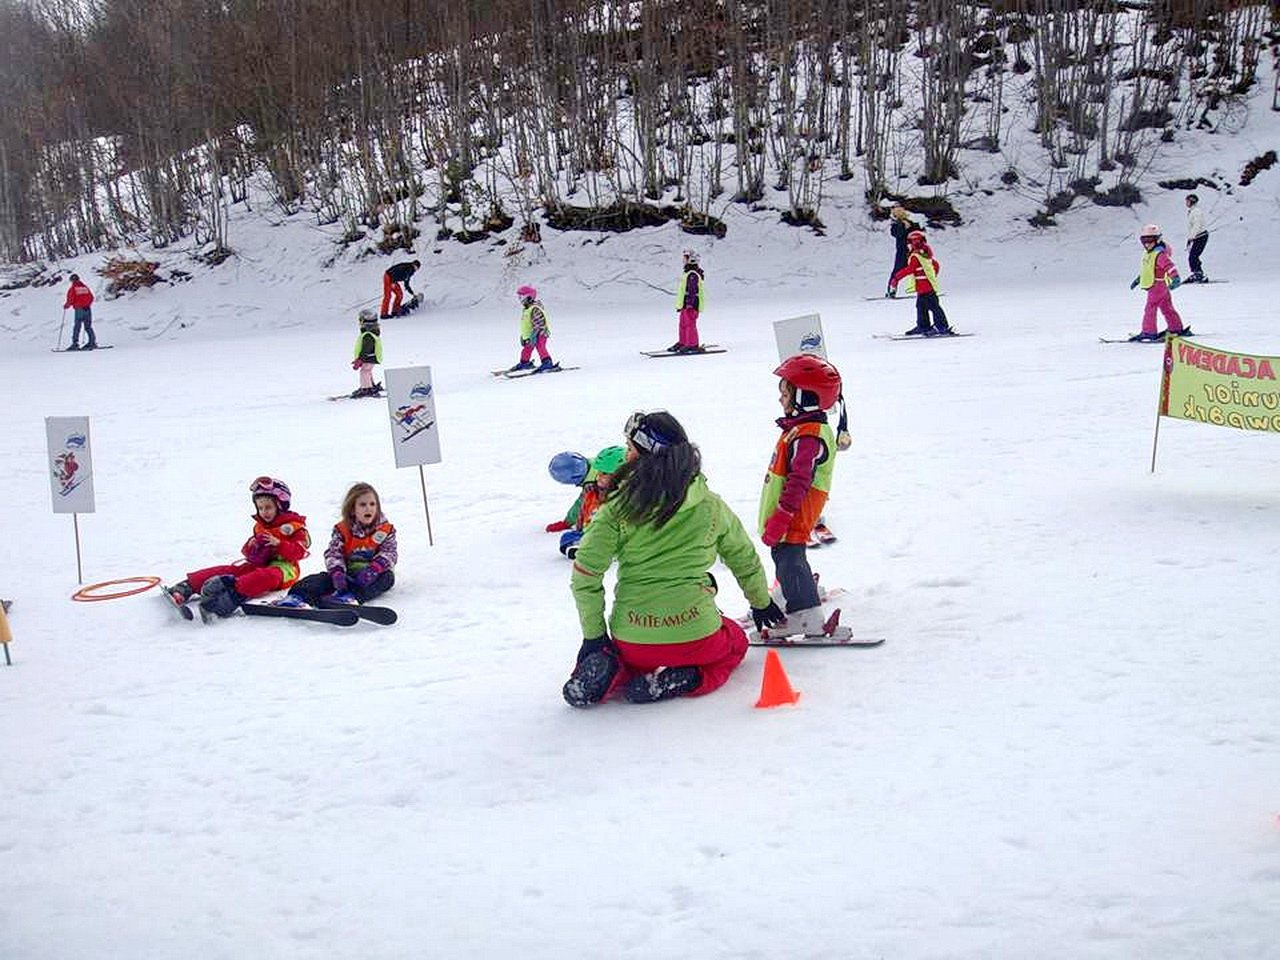 skiteam.gr-ski-academy-thessaloniki-2nd-weekend-18-19-january-2015-3-5-pigadiai-11